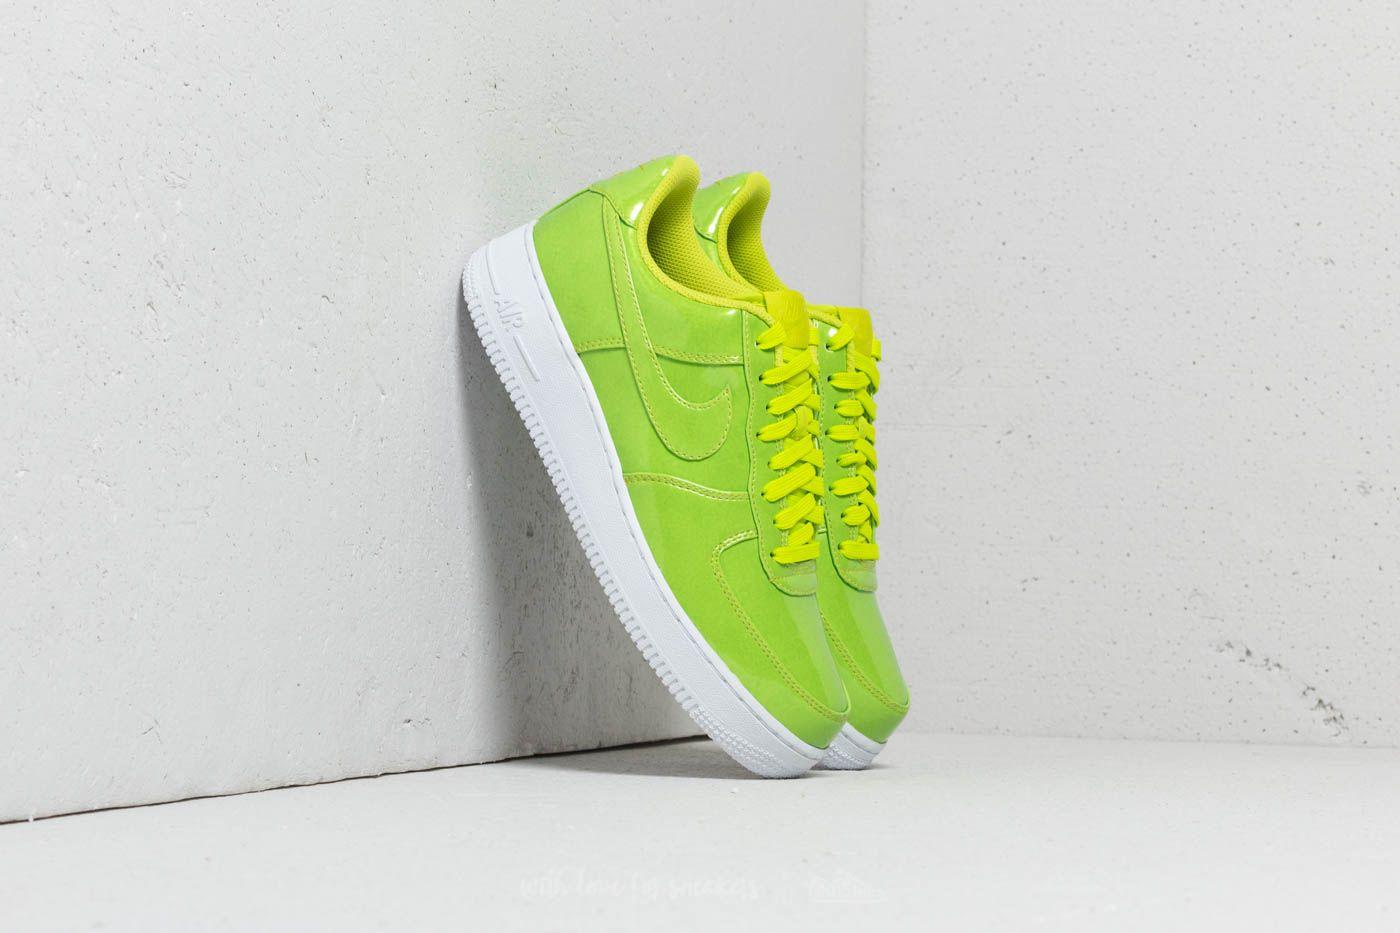 Nike Air Force 1 '07 LV8 UV Cyber Cyber White | Footshop